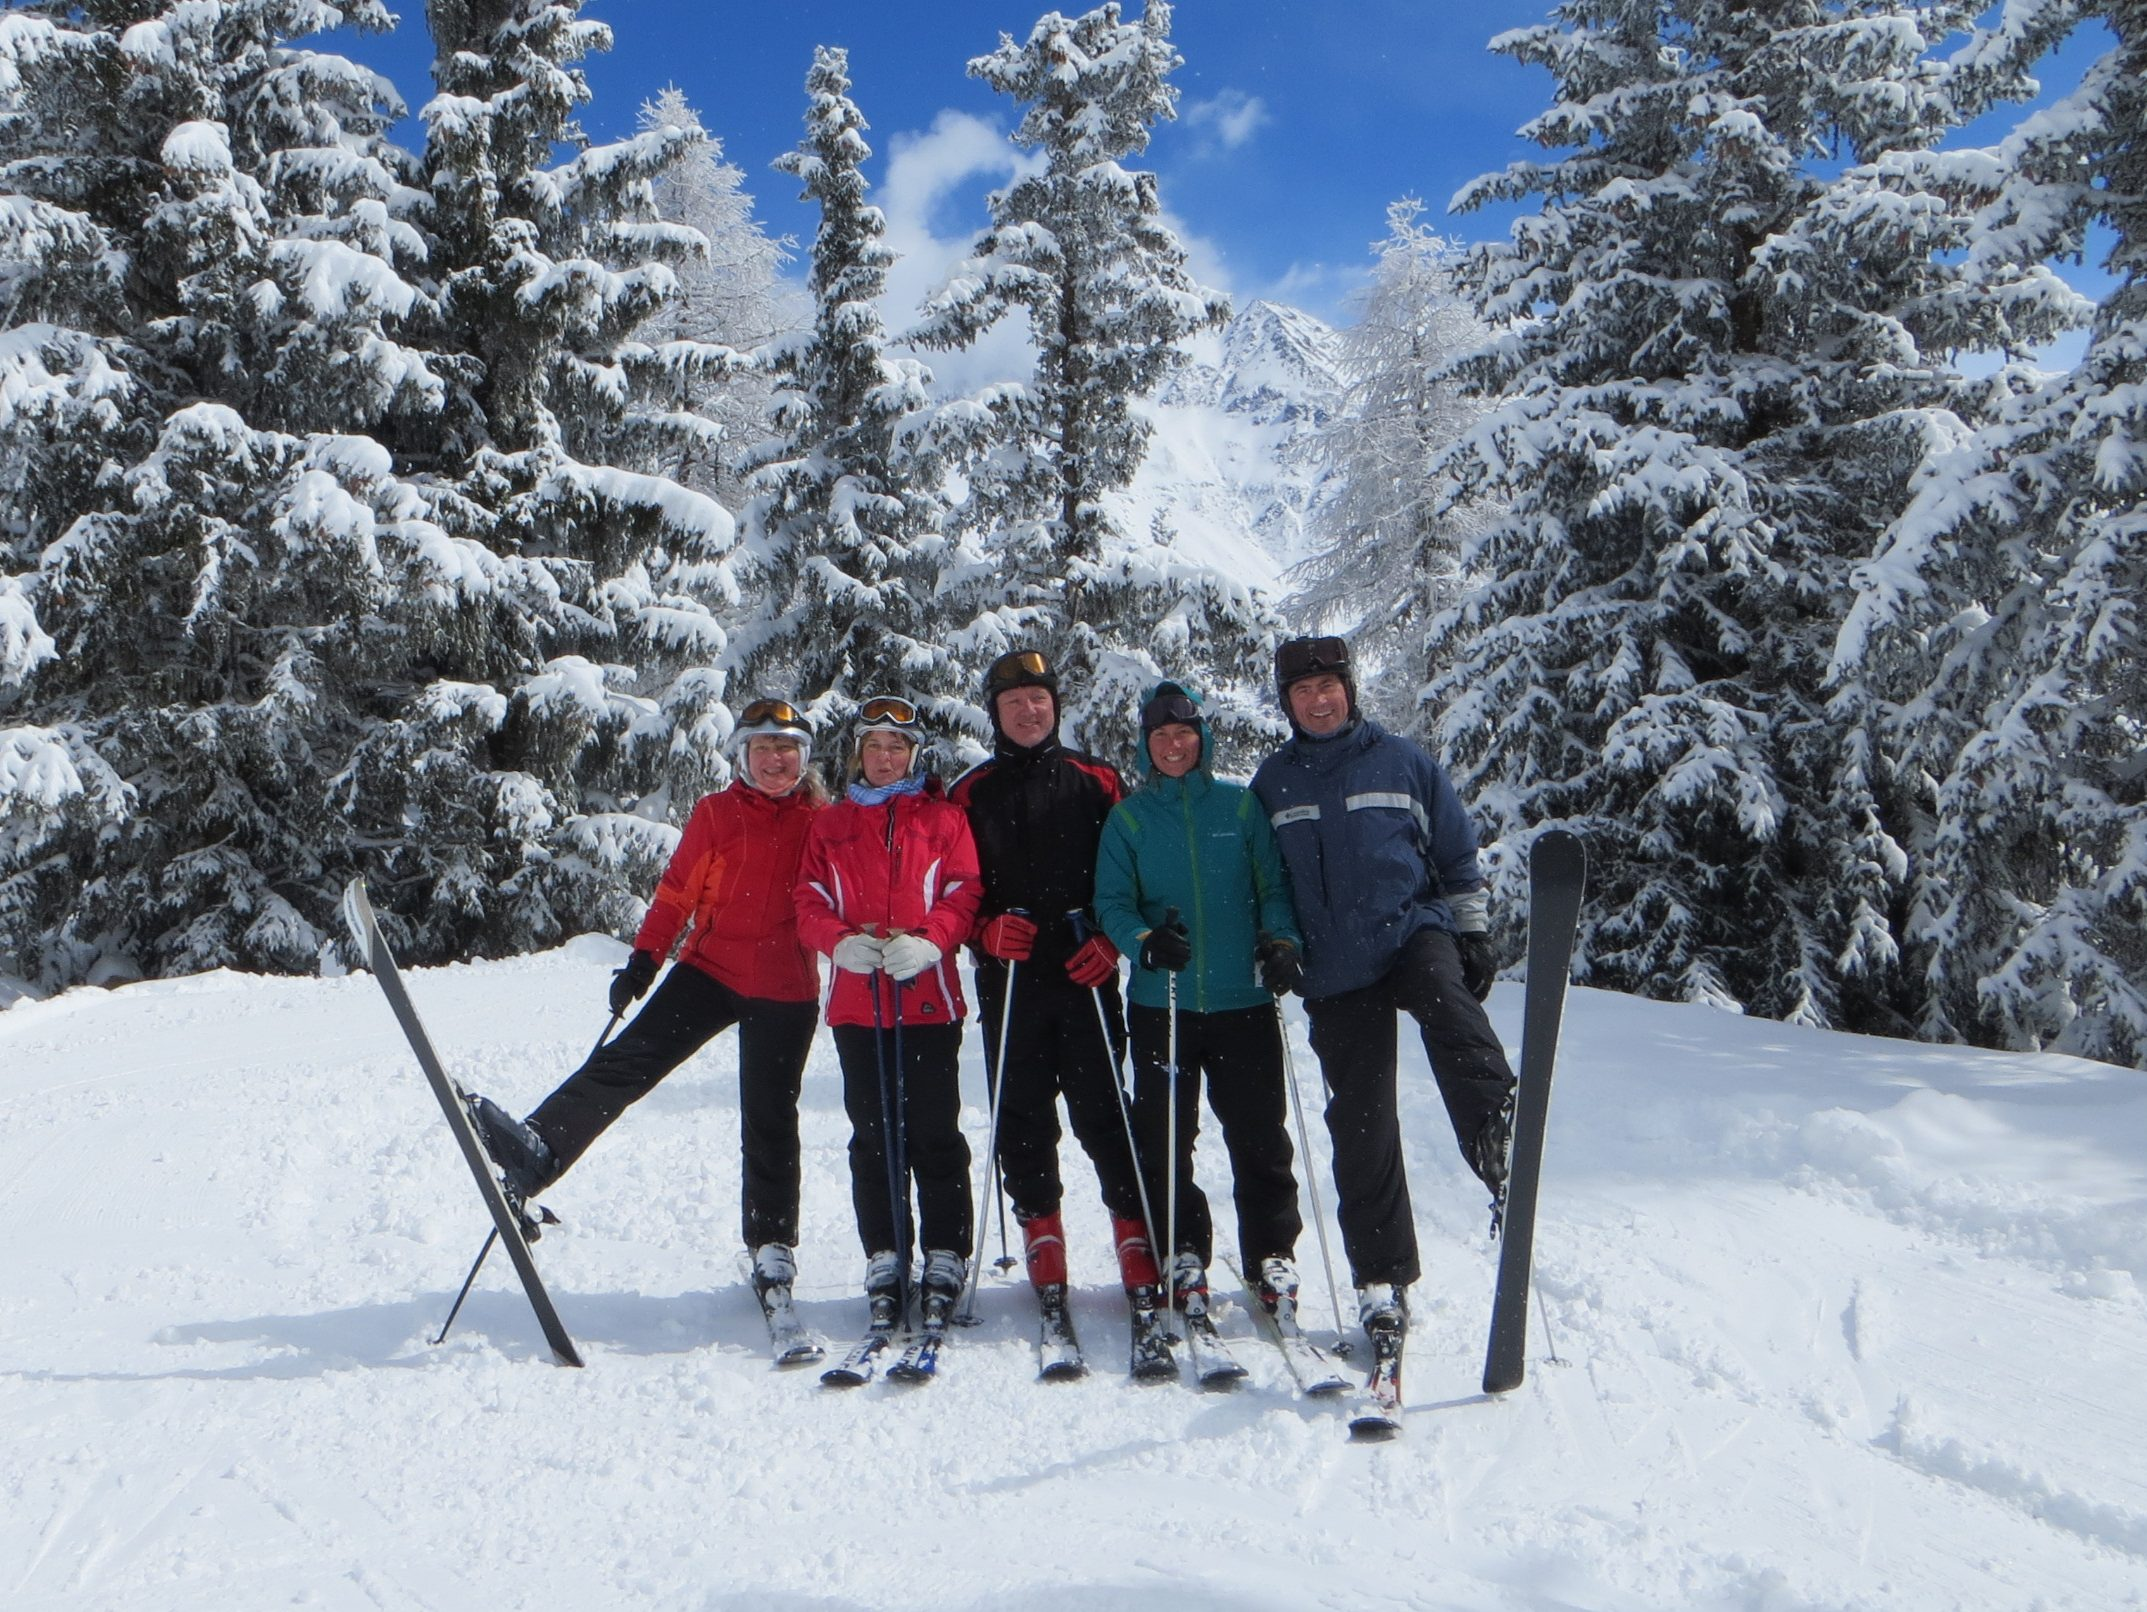 Ski Academy | Ski School | Skiing